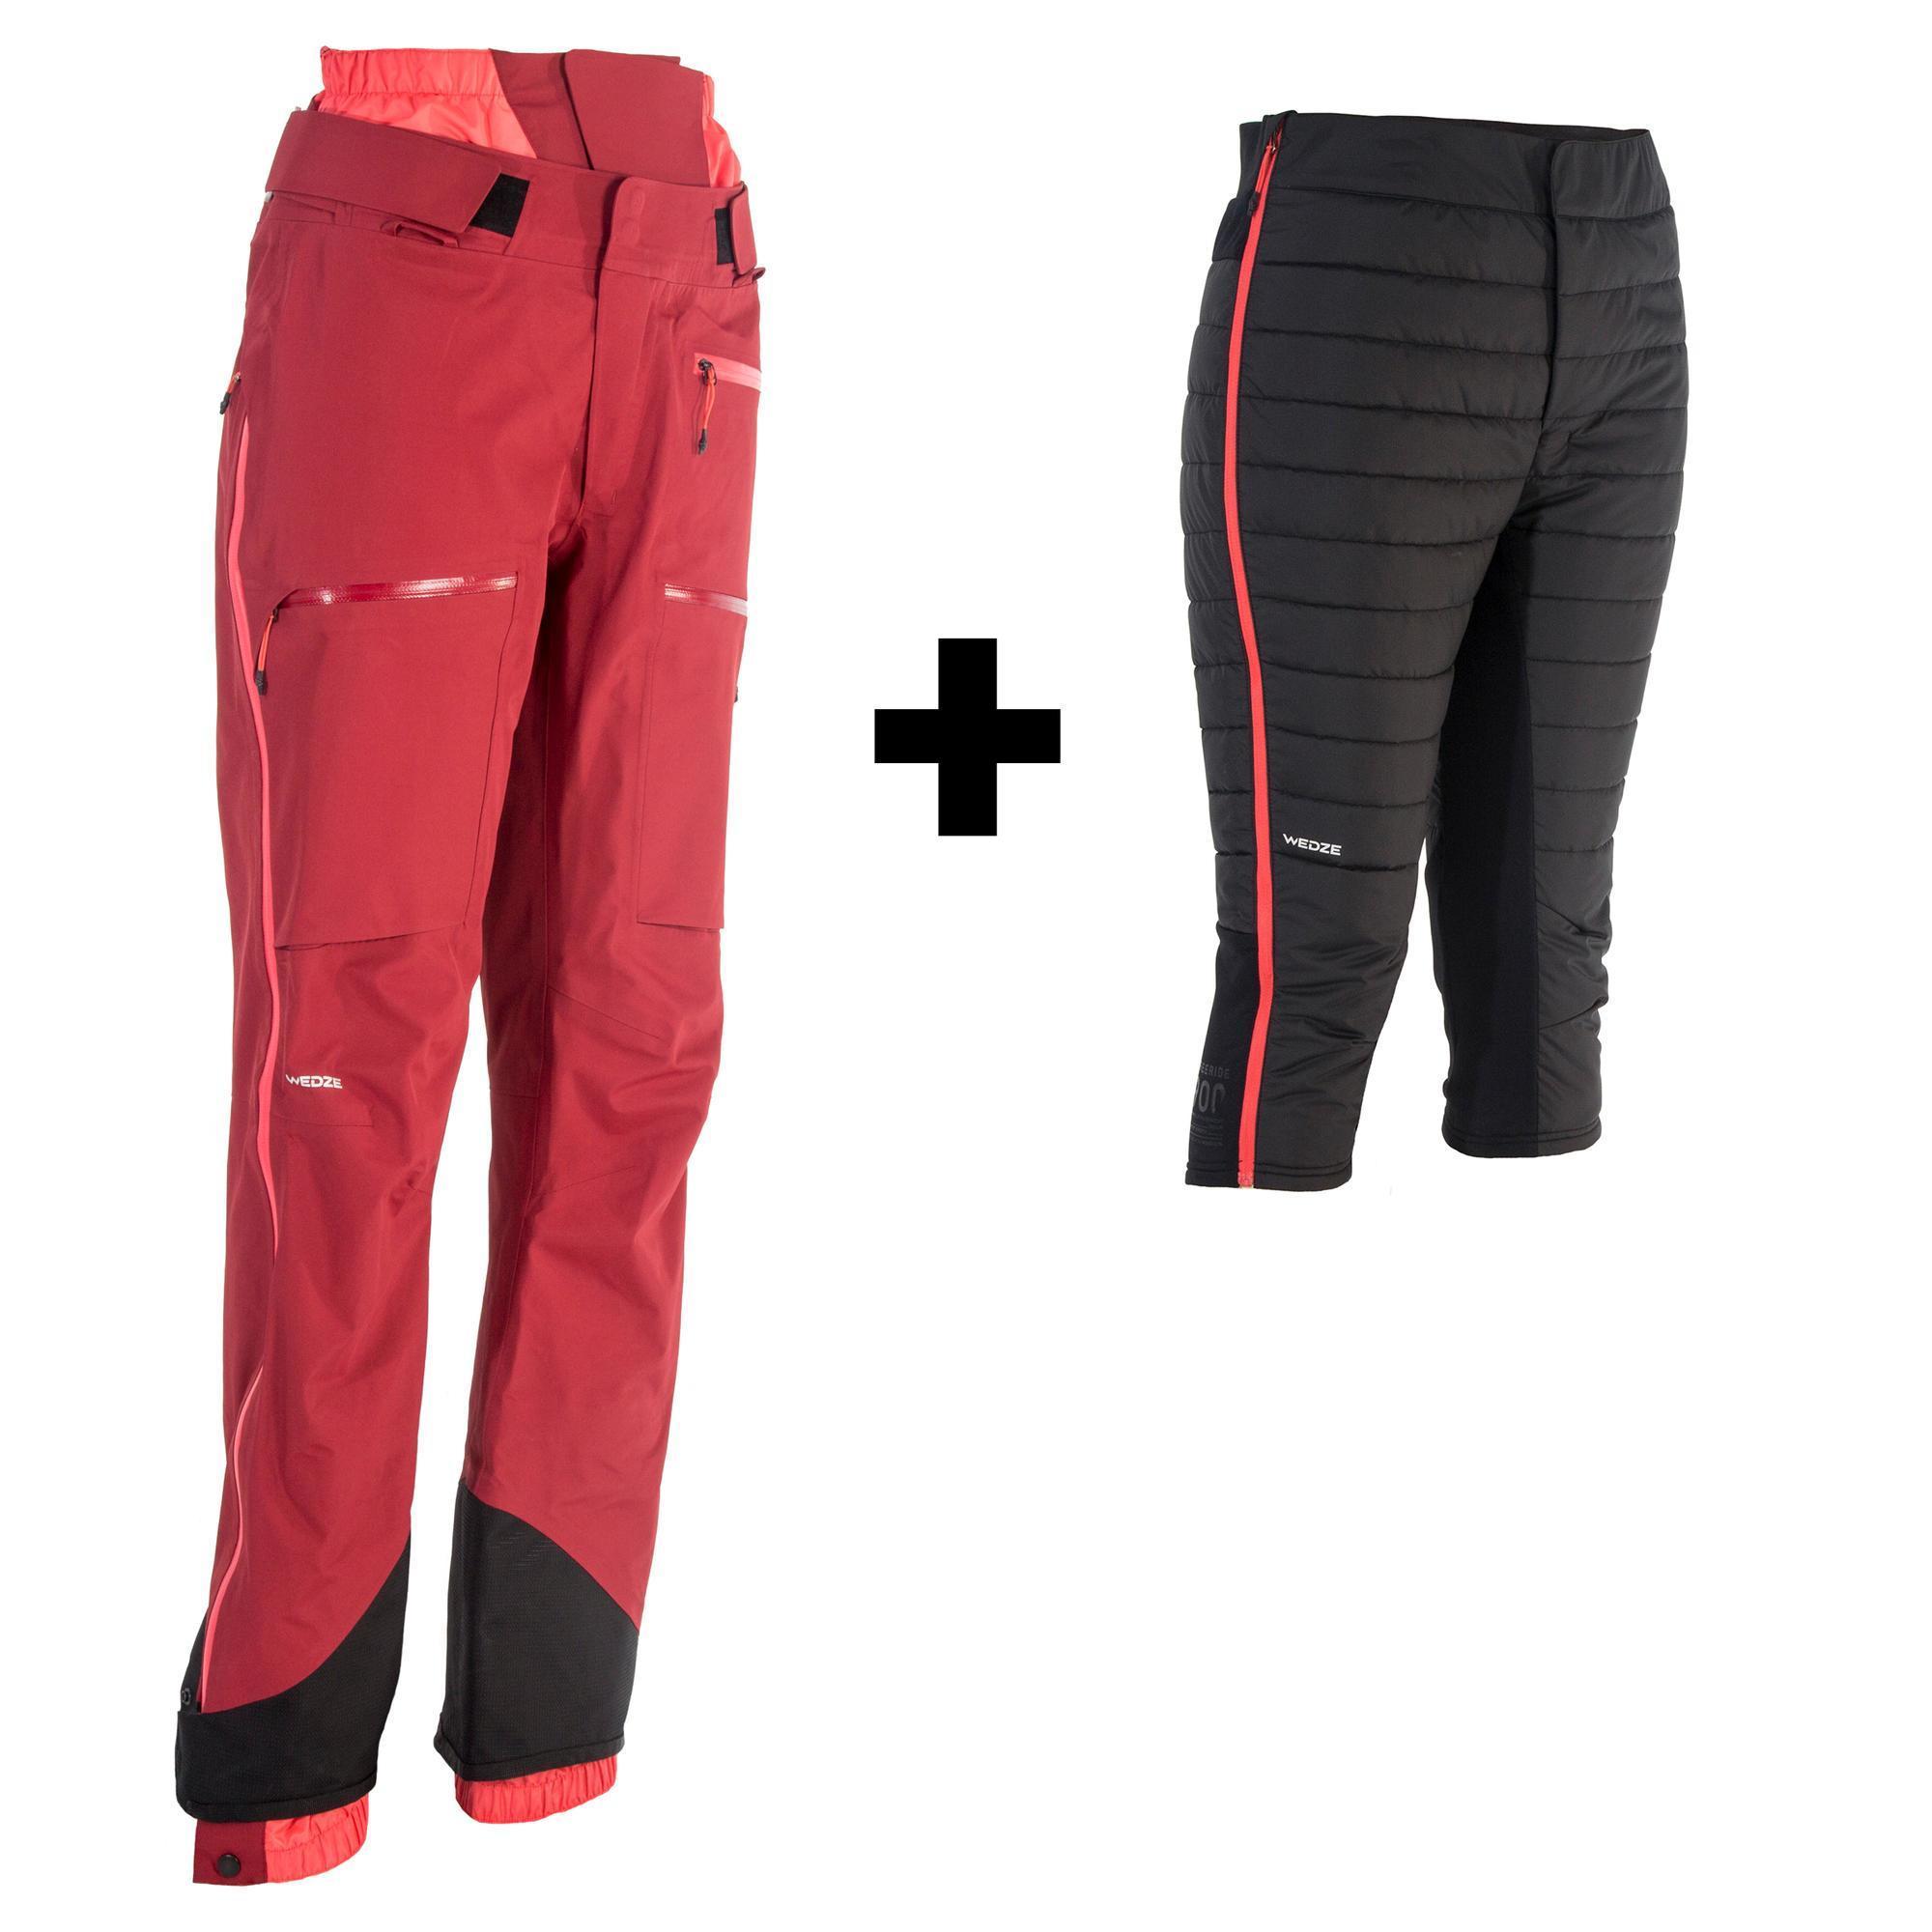 Skihose SFR 900 Freeride Damen bordeauxrot | Sportbekleidung > Sporthosen > Skihosen | Rot | Wed'ze